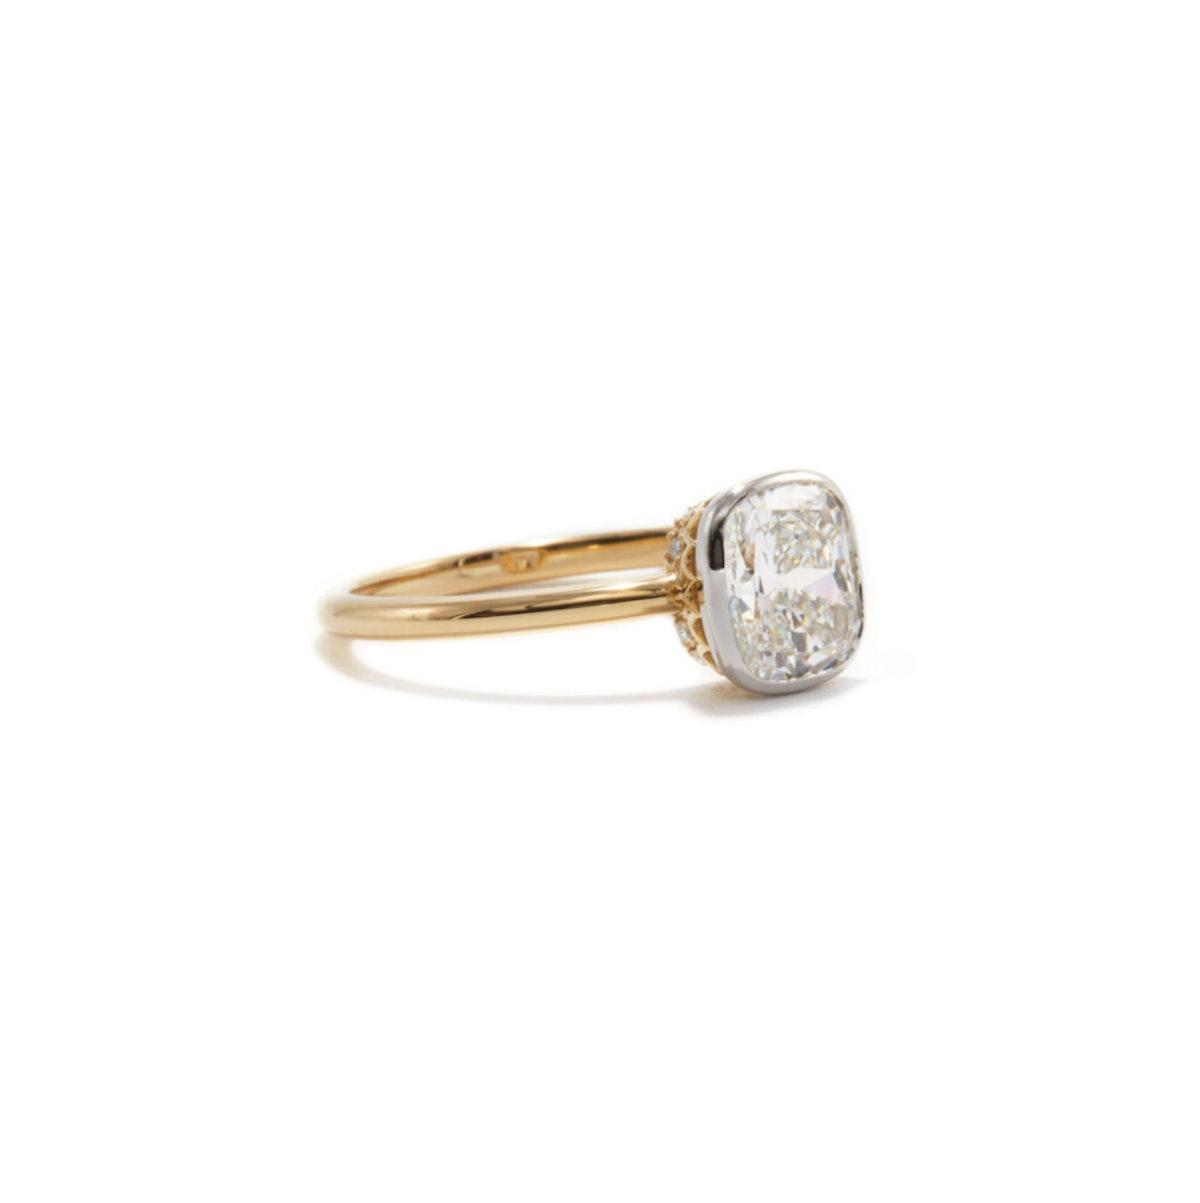 Ashley Zhang's 1.5 carat Aurora cushion cut engagement ring.